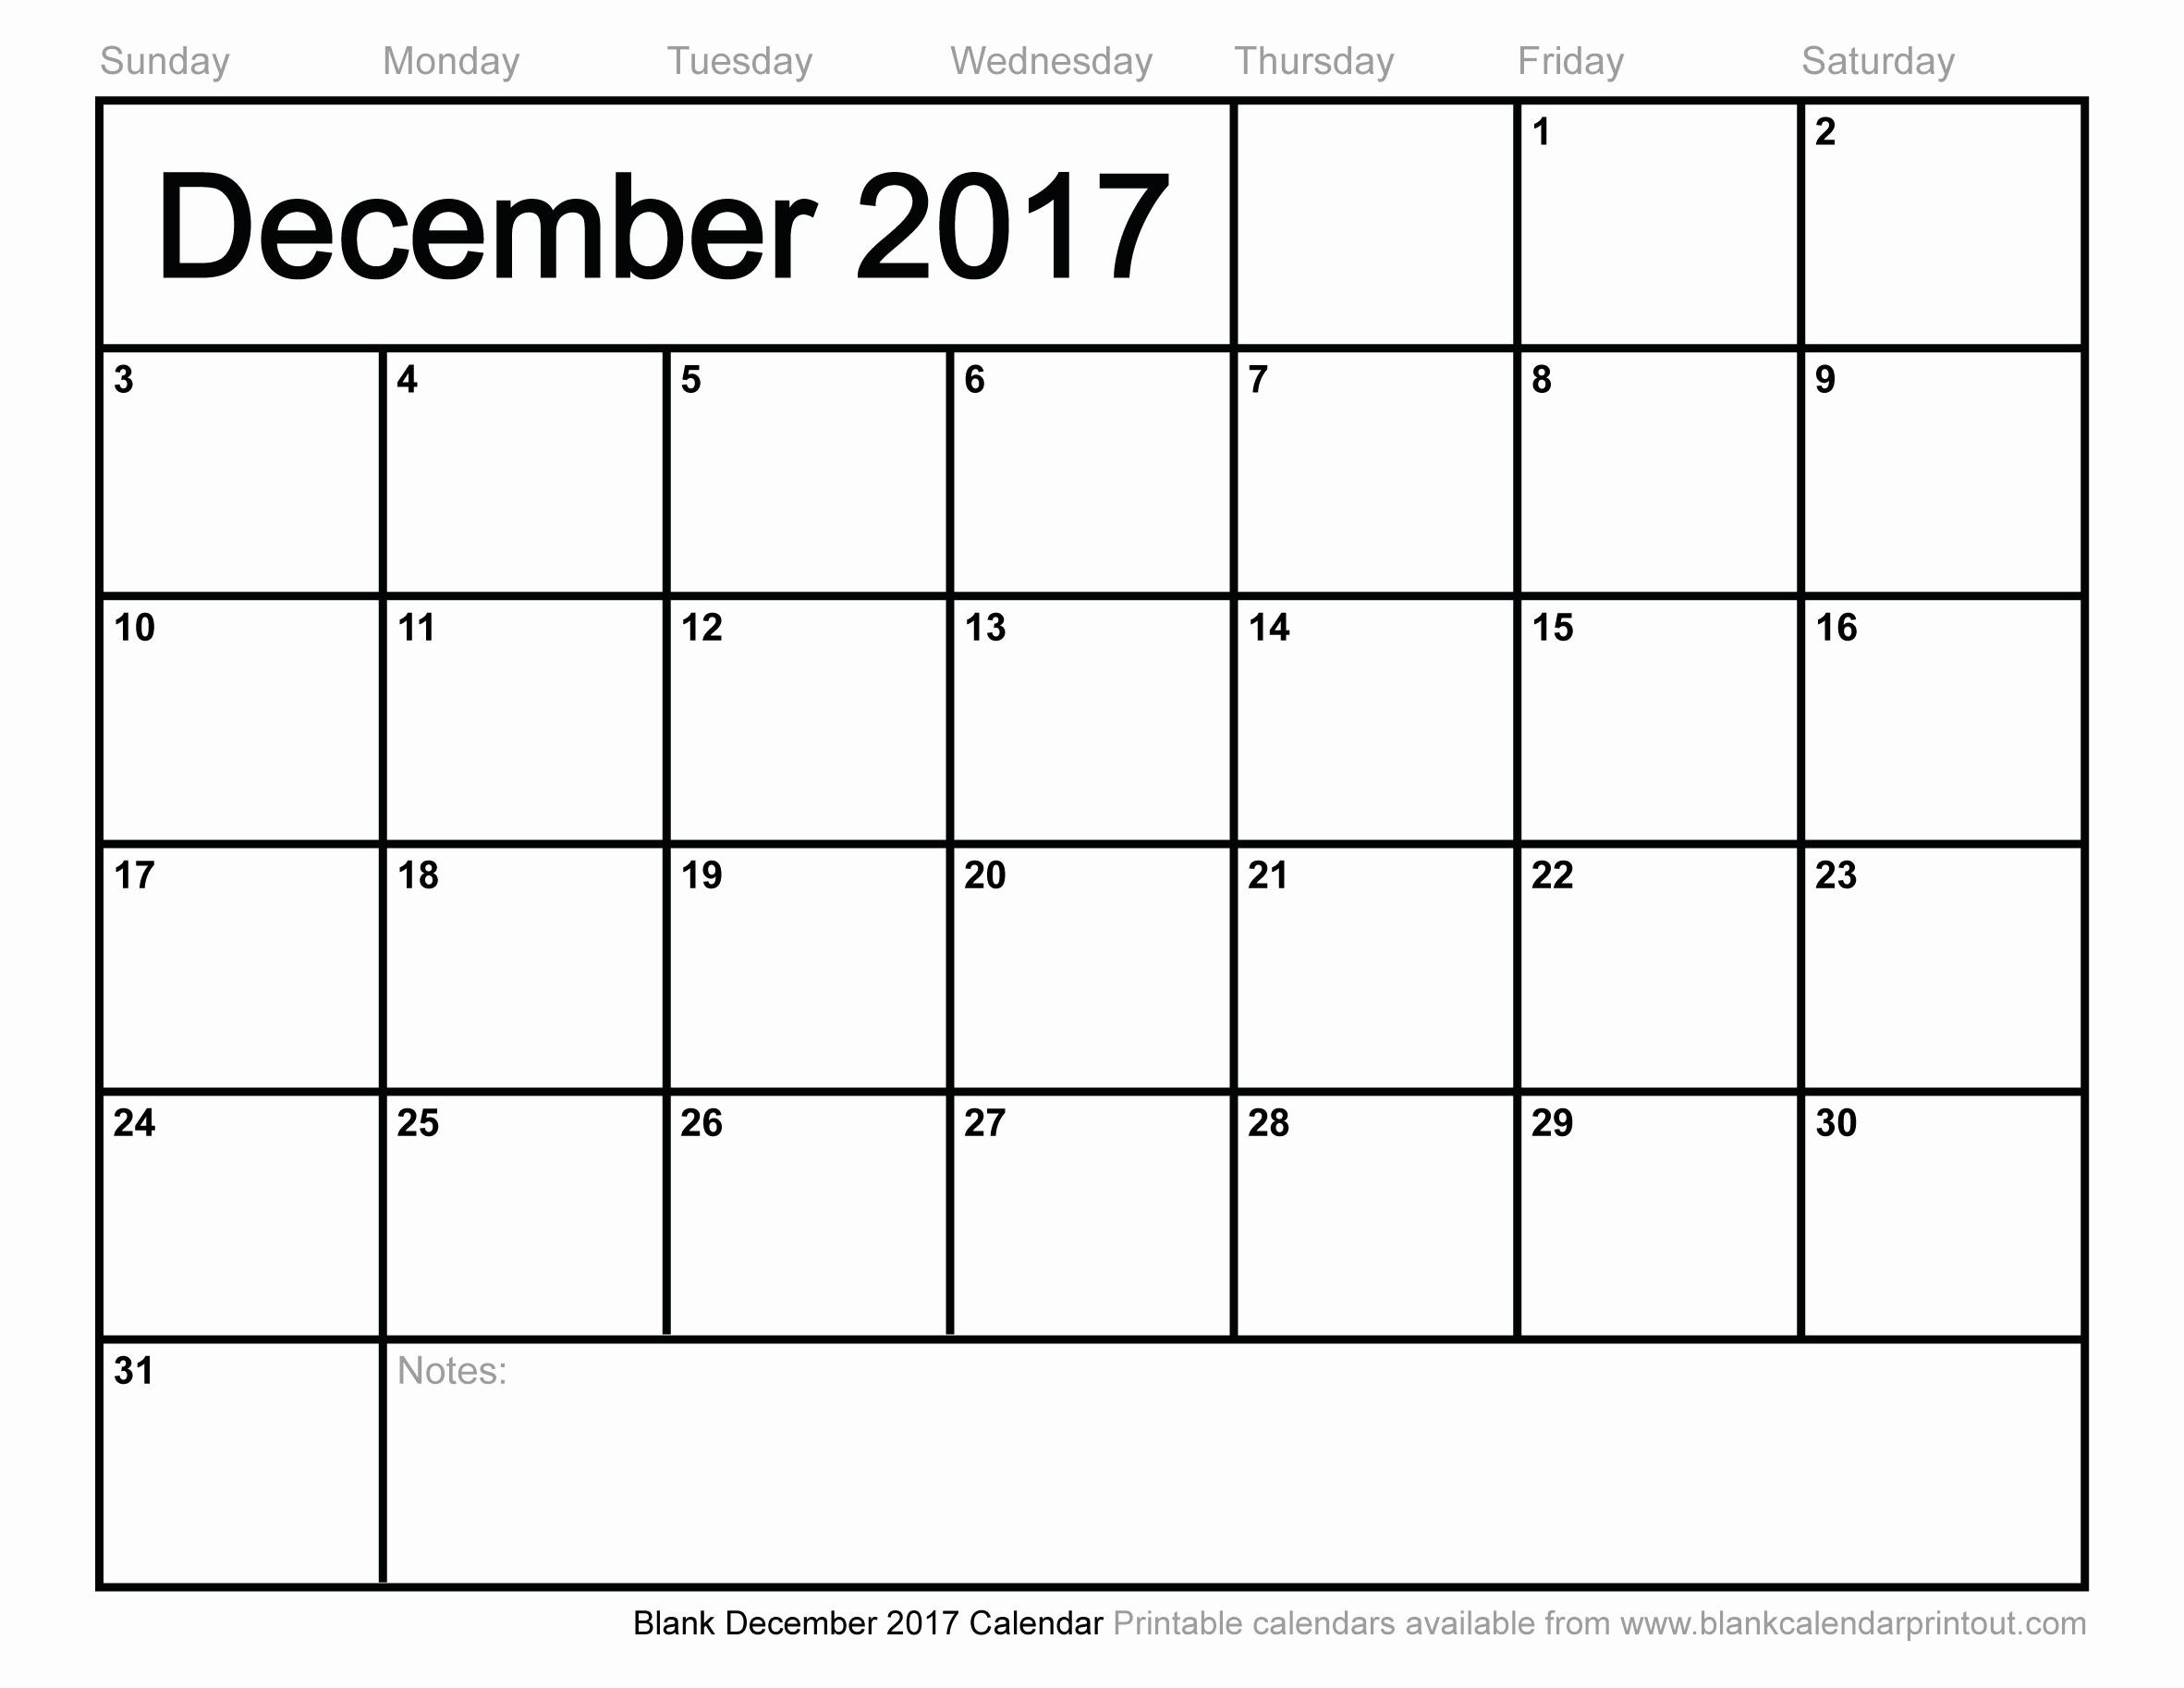 Free Blank Printable Calendar 2017 Awesome December 2017 Calendar Canada